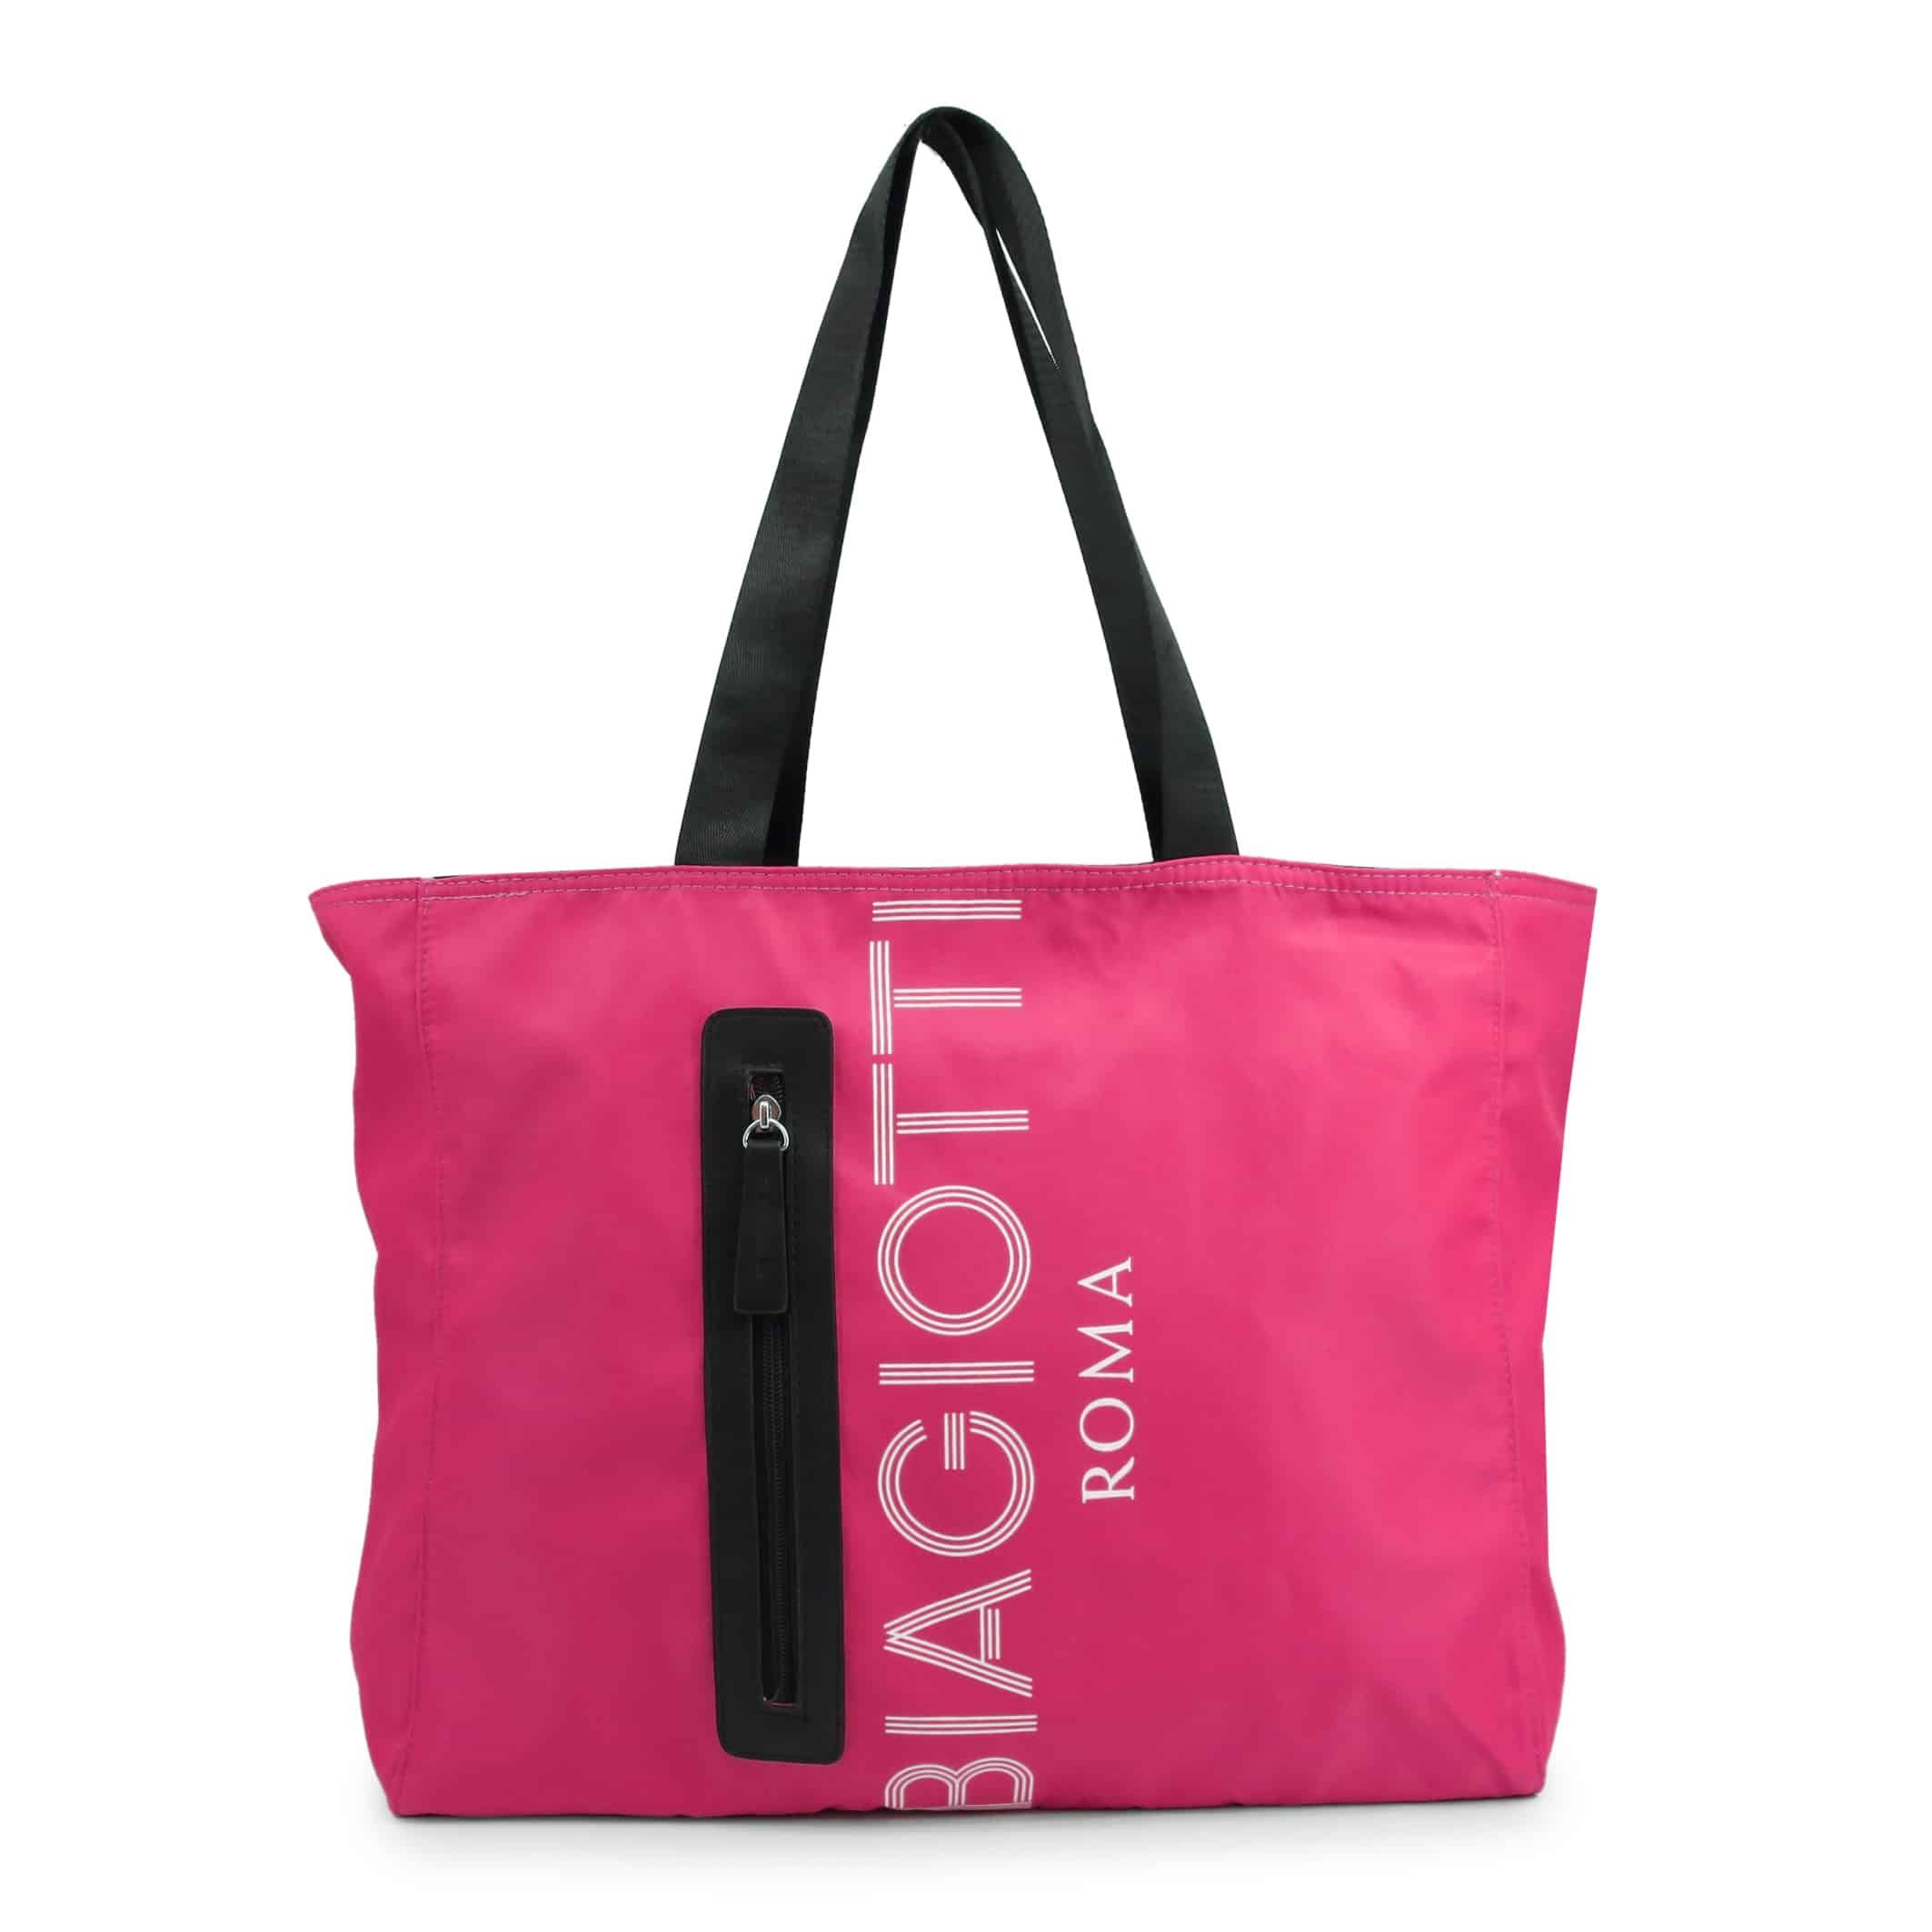 Laura Biagiotti - LEYA_LB20S-261-1    You Fashion Outlet